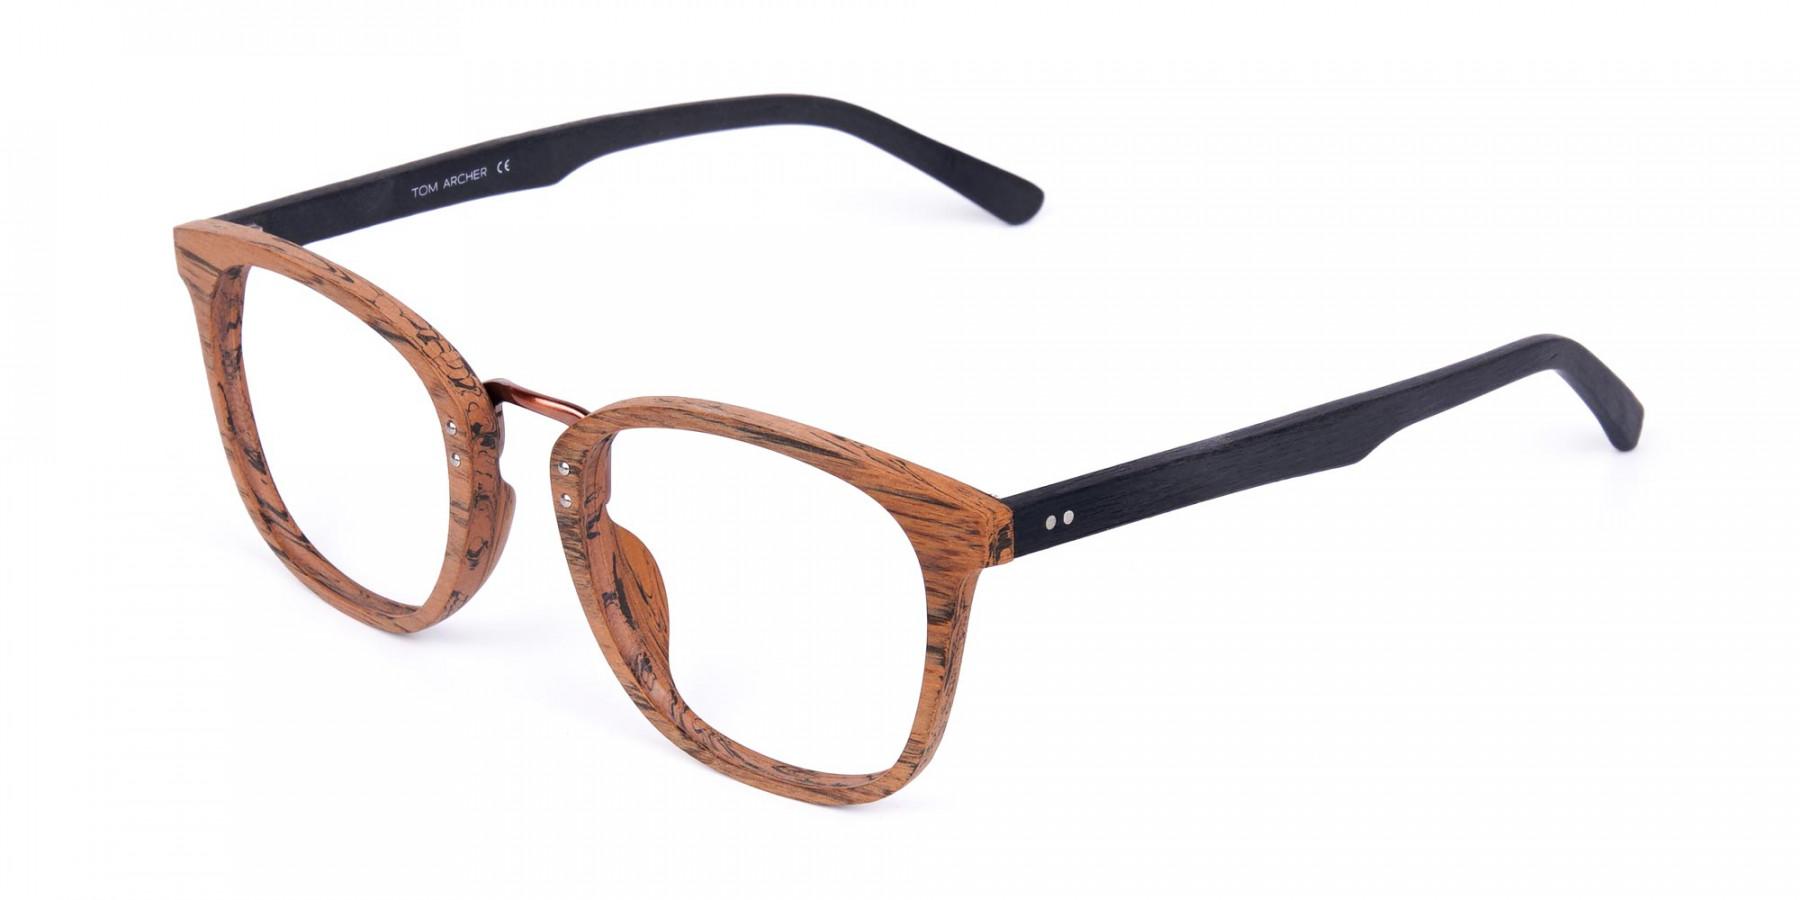 Wooden-Texture-Elm-Brown-Rim-Glasses-1